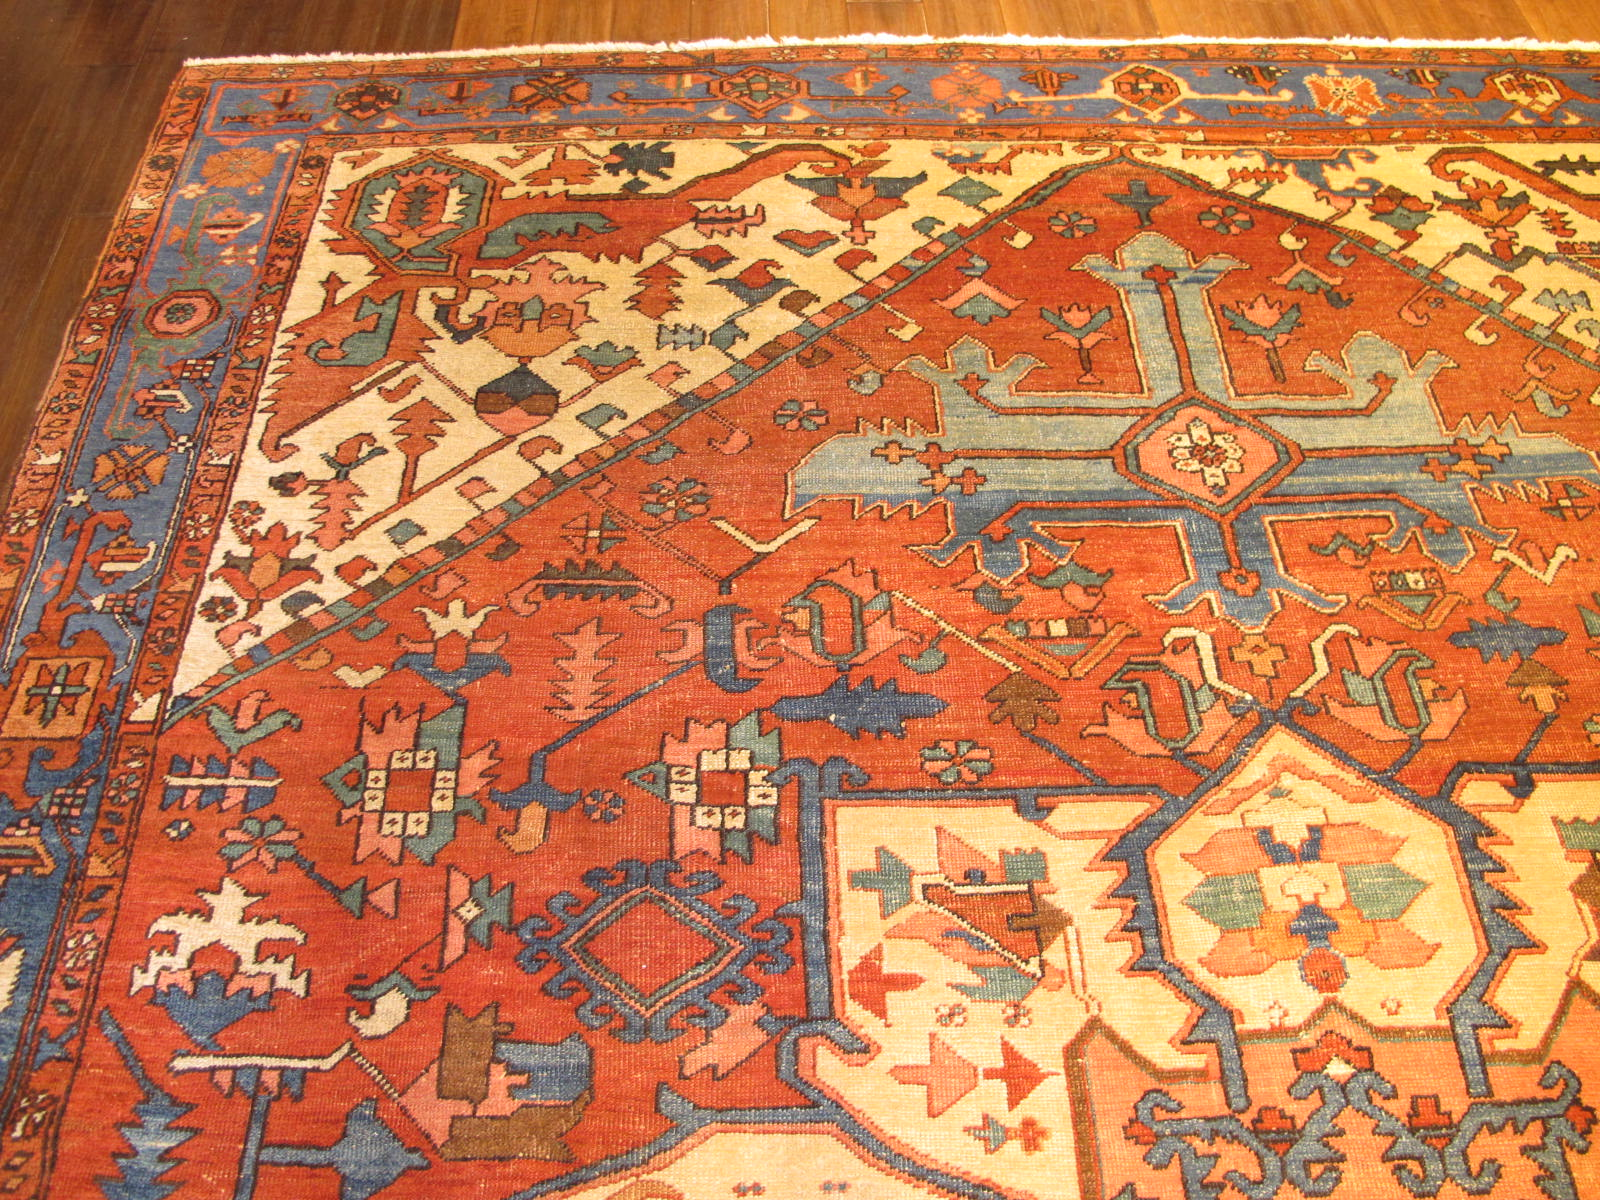 23196 antique persian serapi rug 9,10 x 12,3 (3)